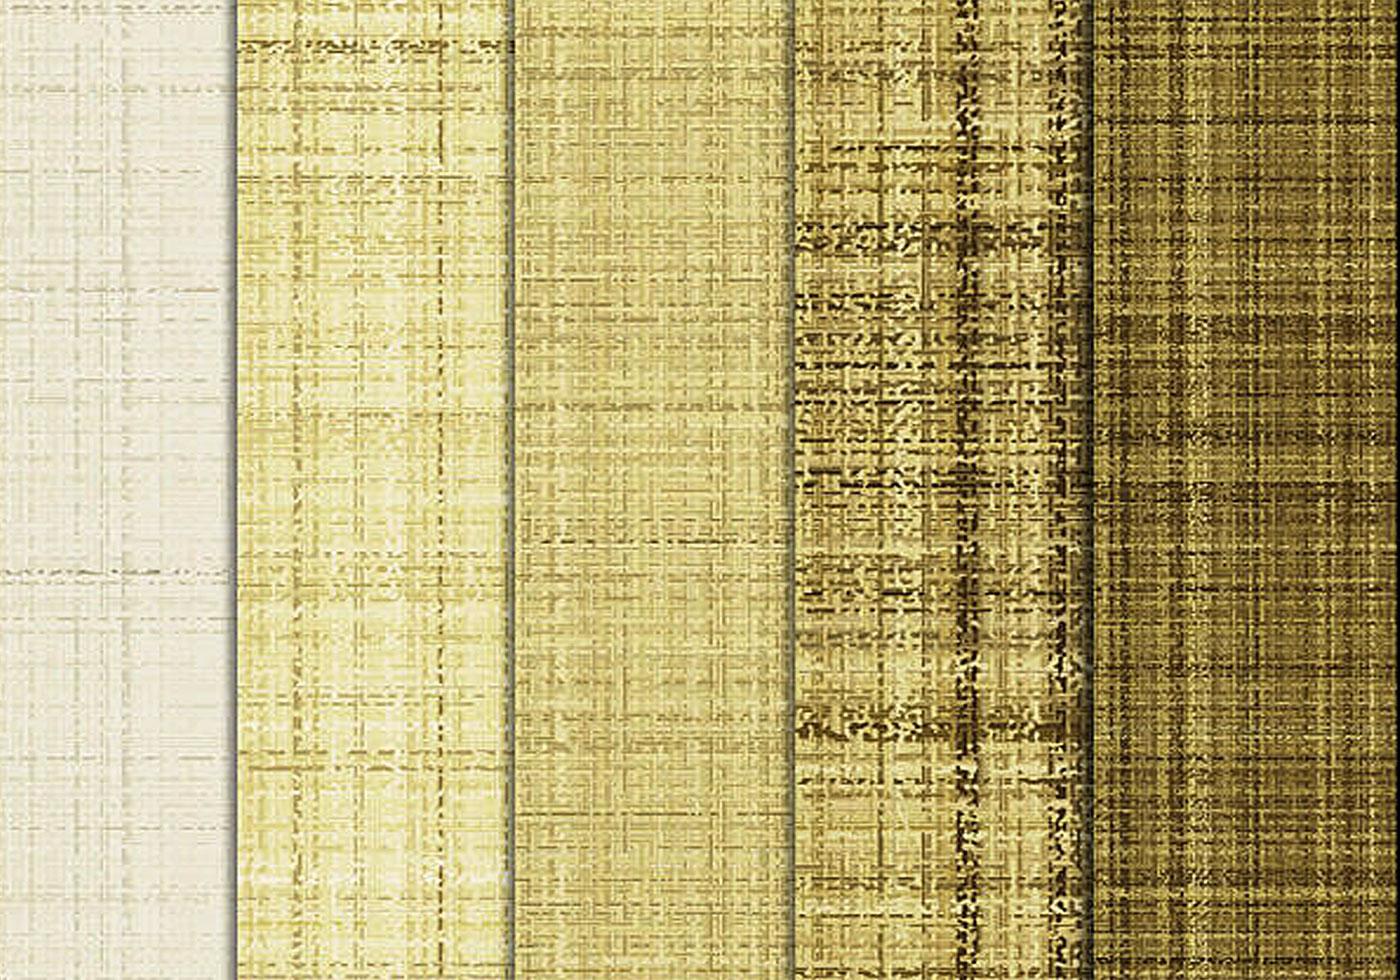 Coffee Break Textured Seamless Fabric Patterns Free